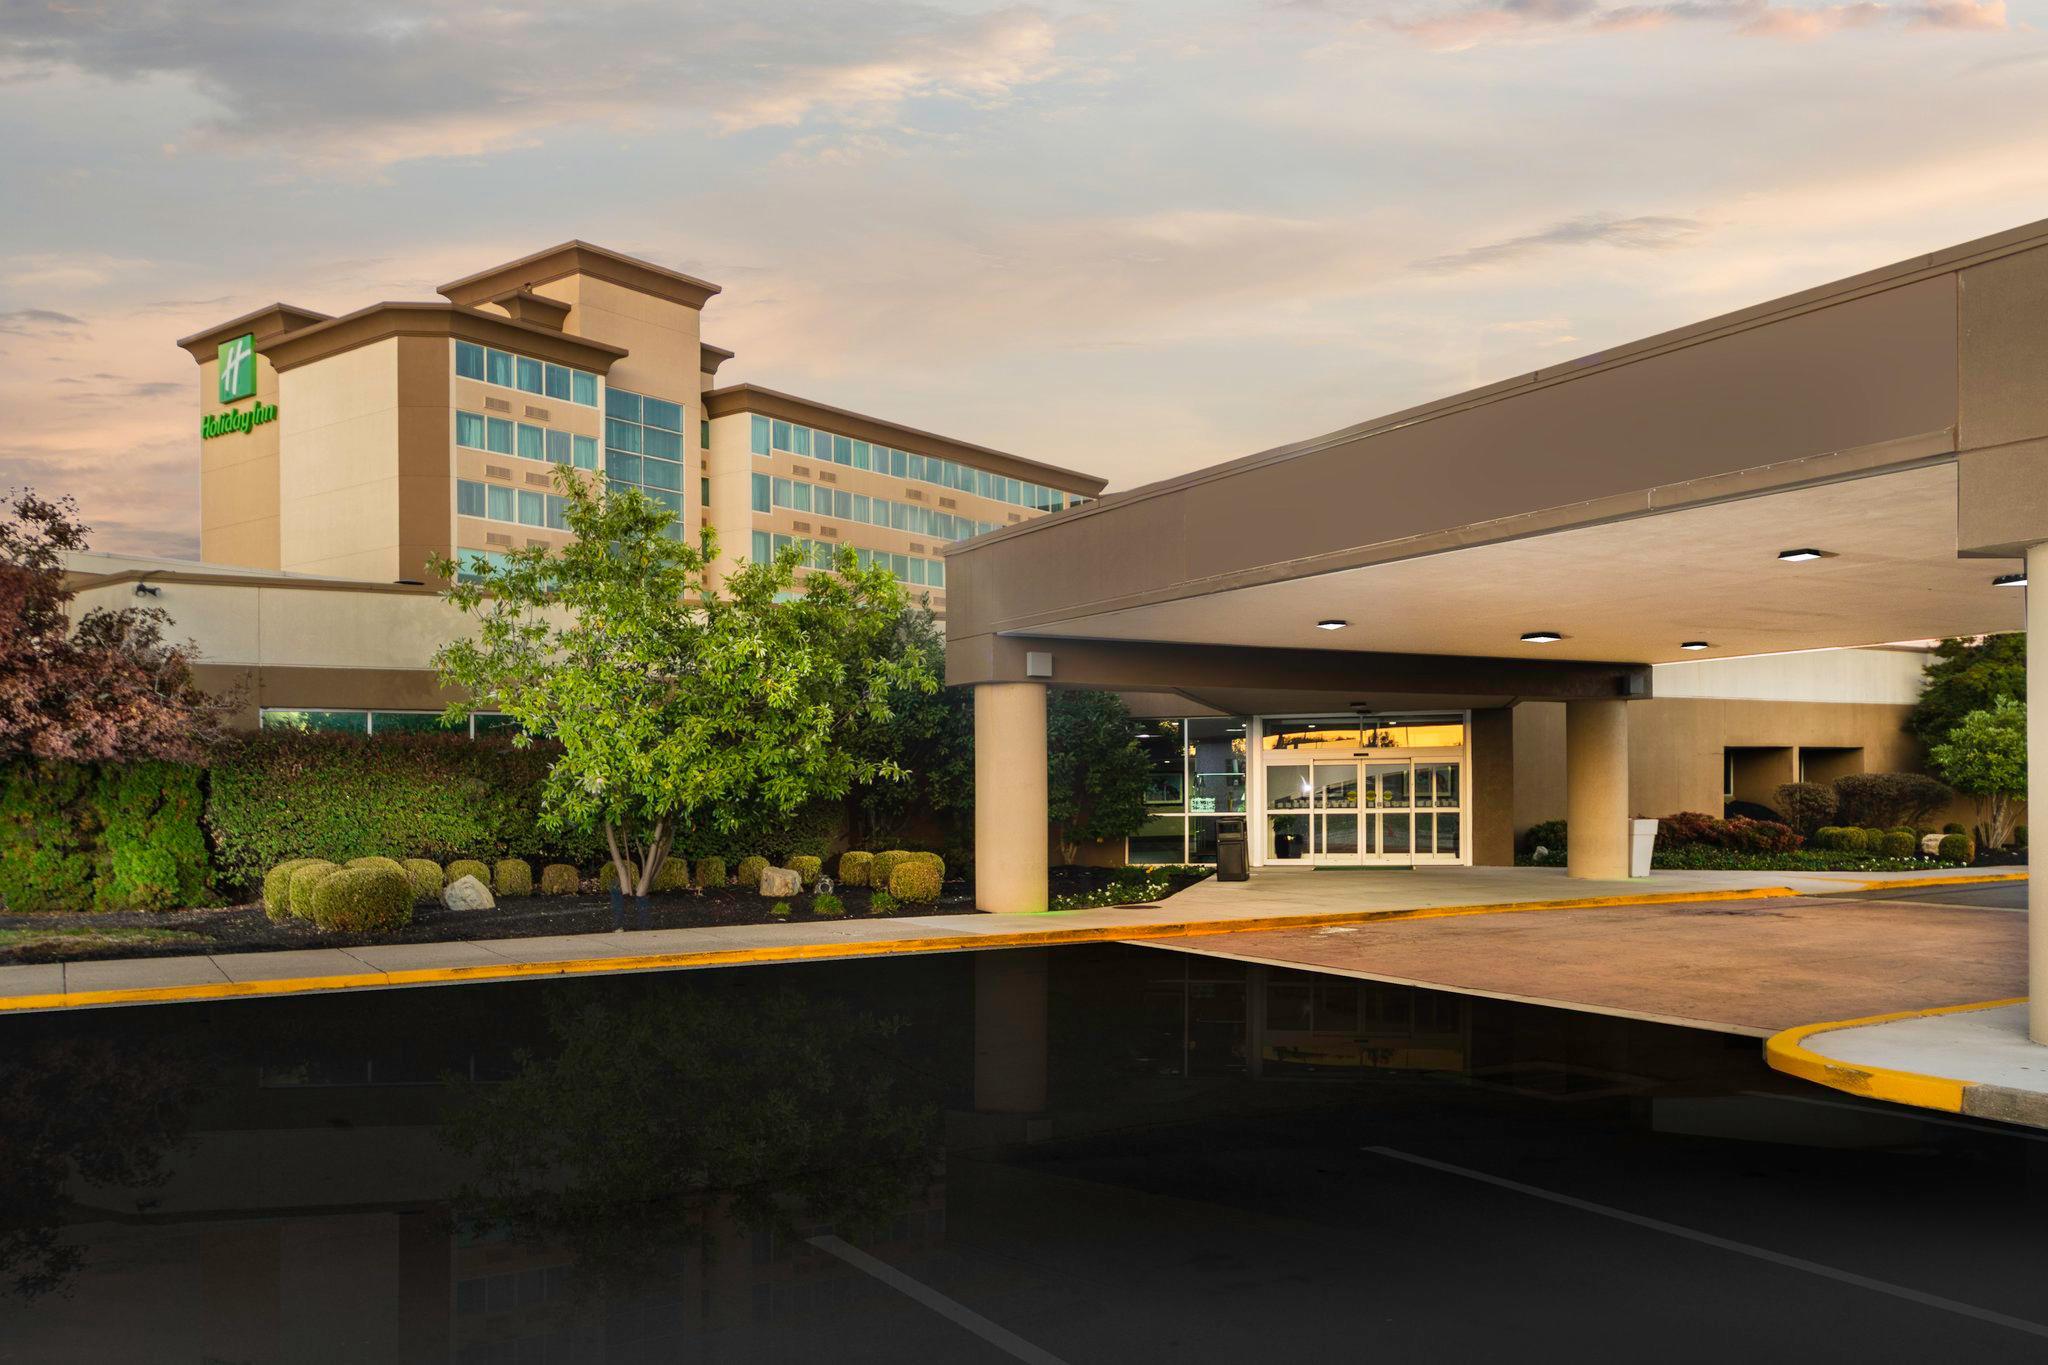 Holiday Inn Louisville East - Hurstbourne, an IHG Hotel